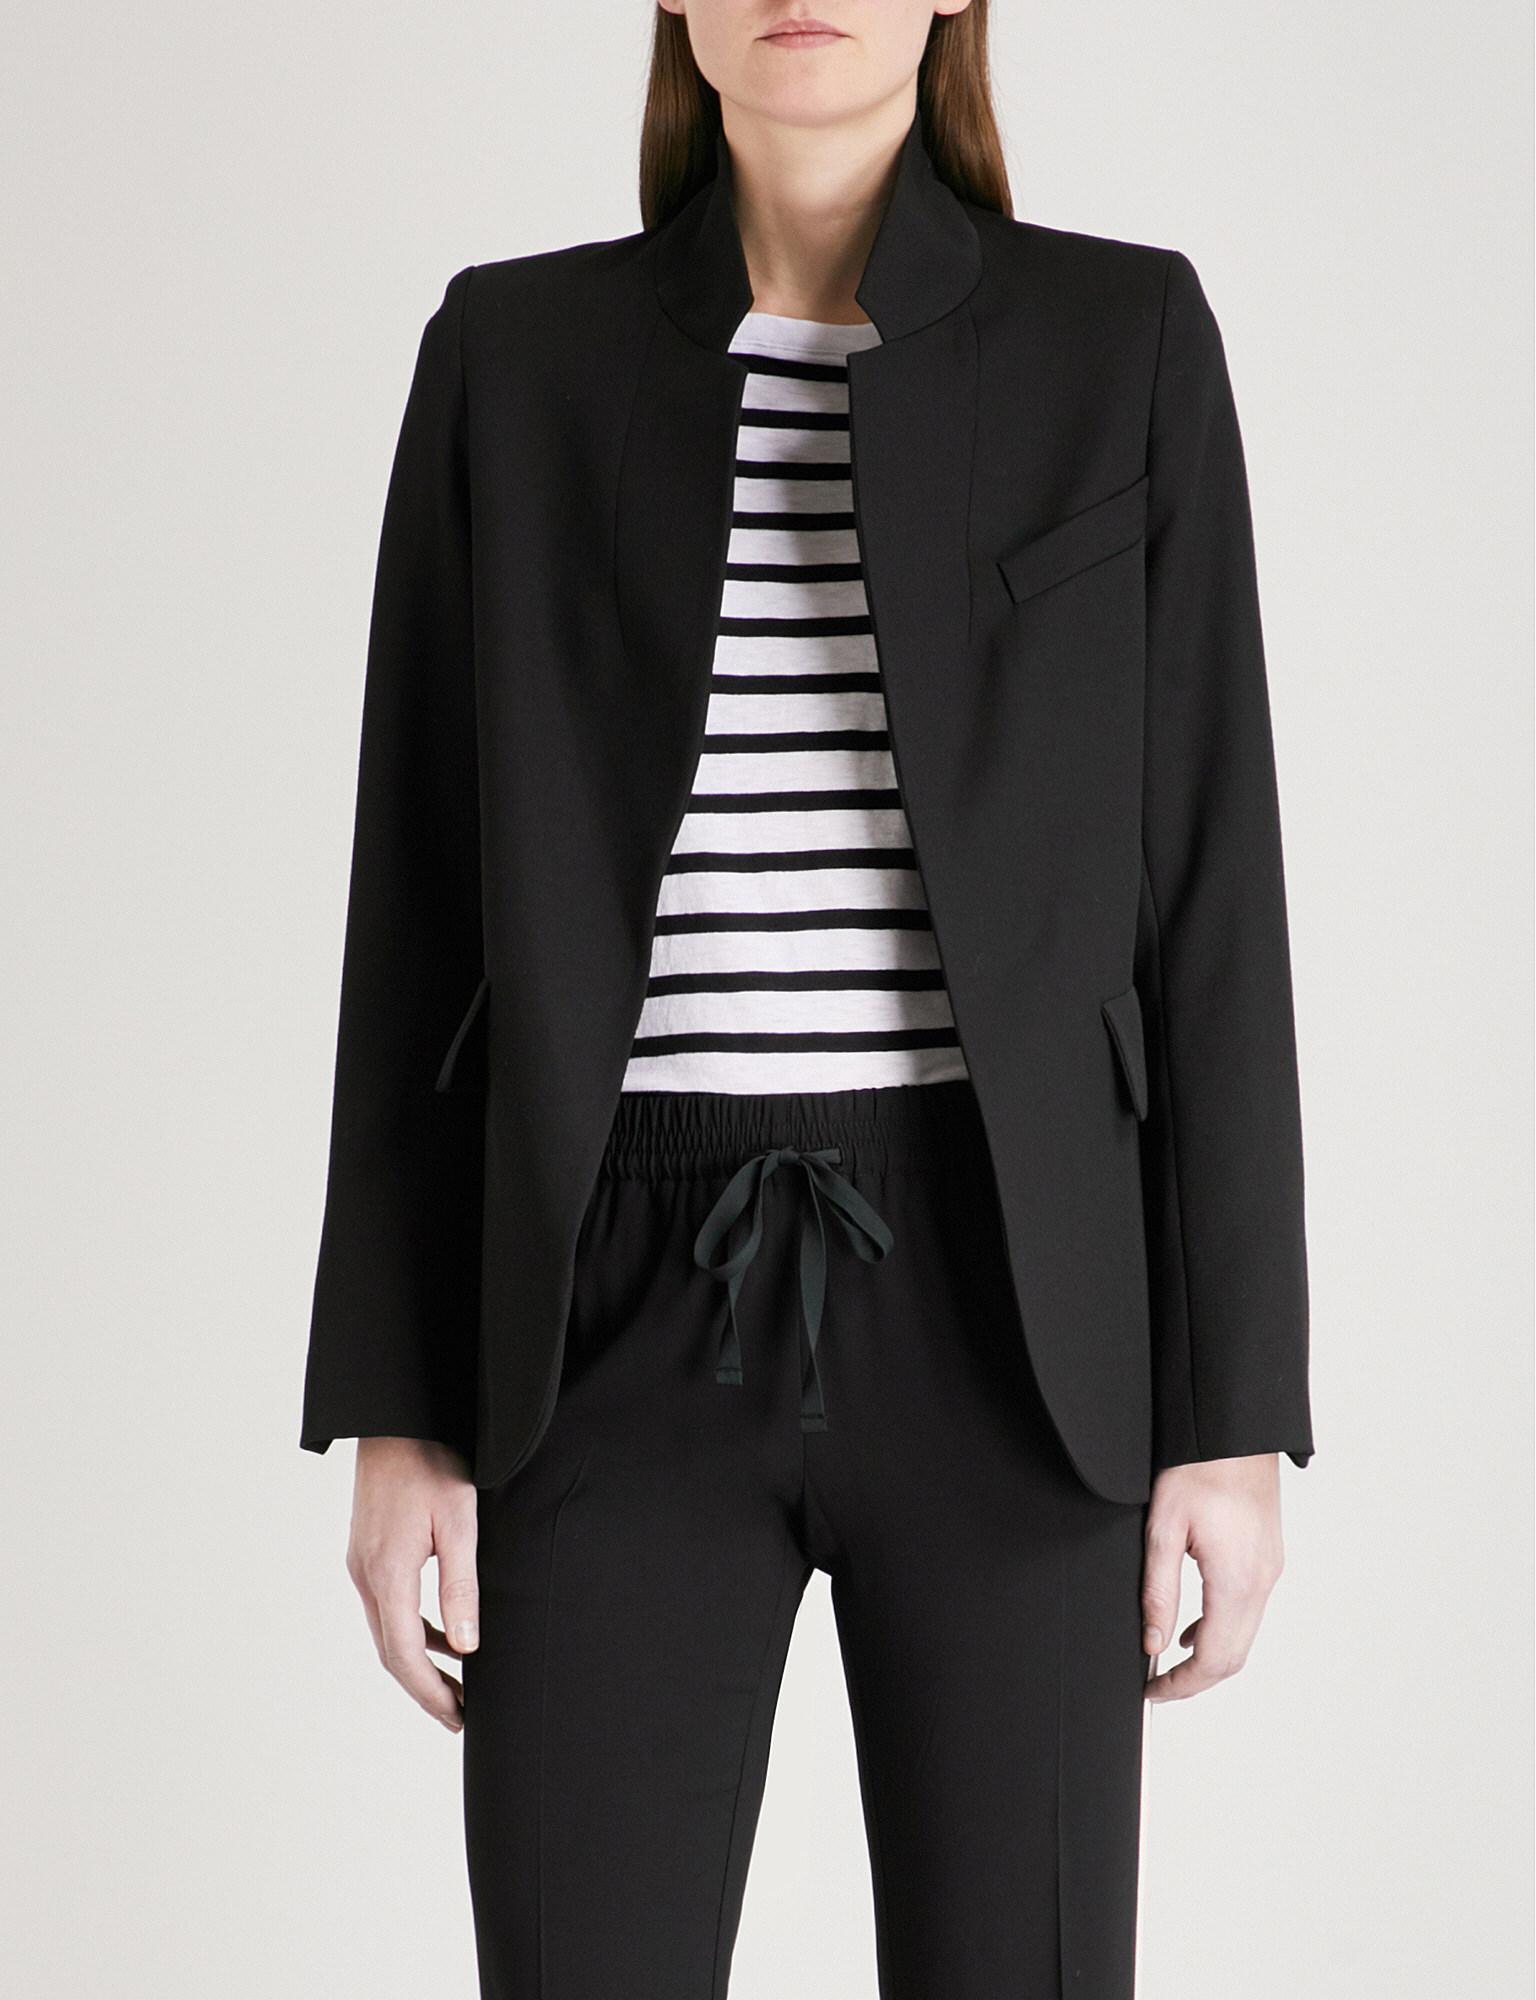 Zadig & Voltaire Wool Tailored Blazer Footlocker Pictures XyKON